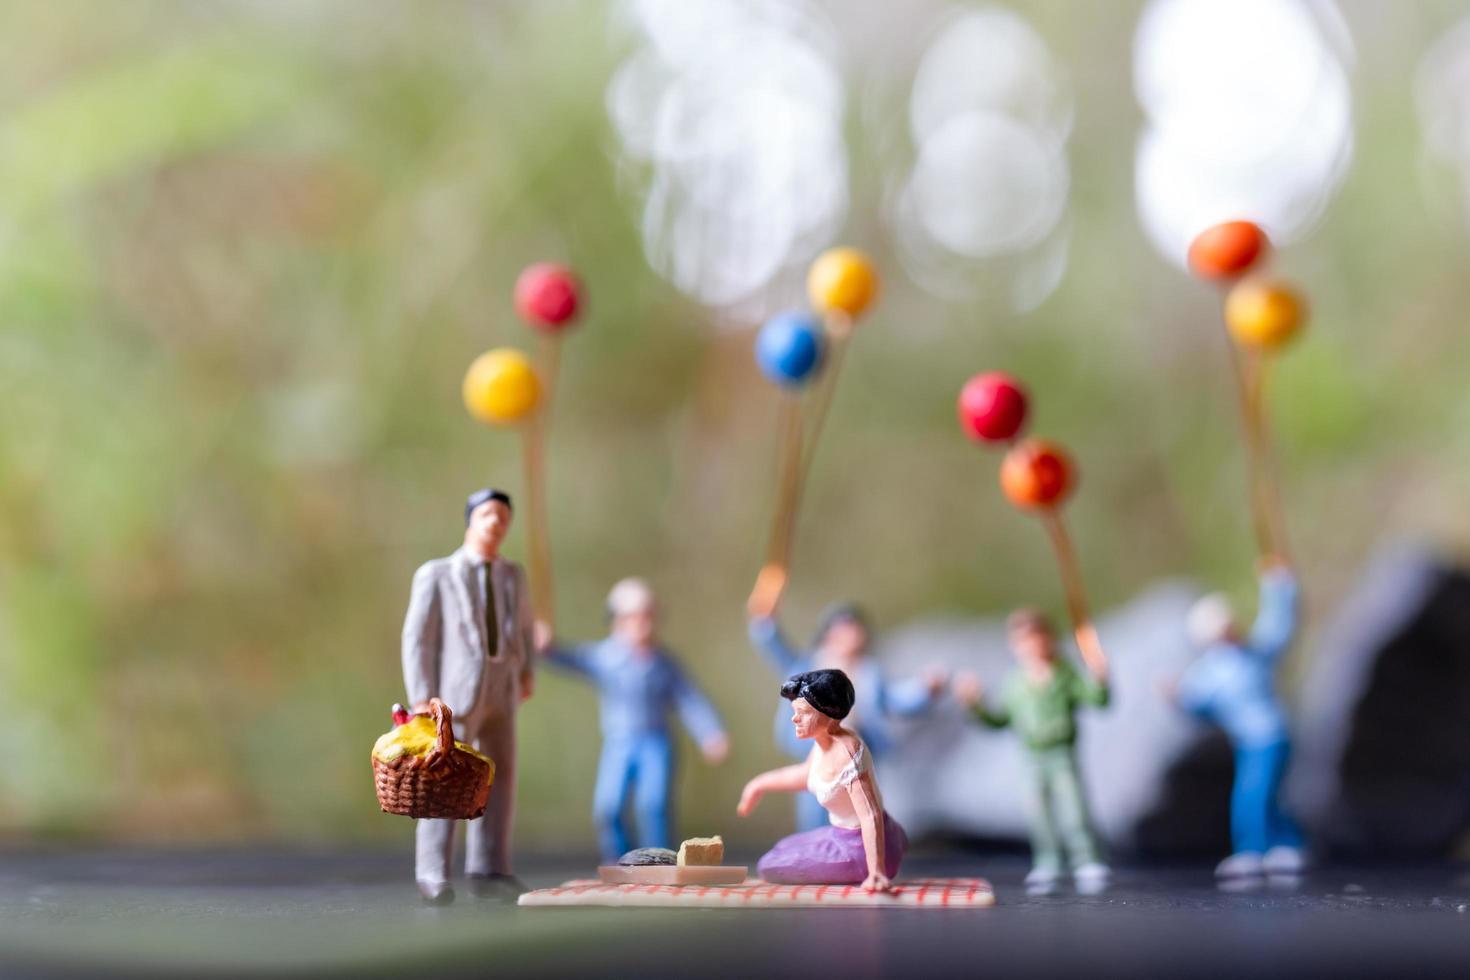 Miniature figurines at a park picnic photo